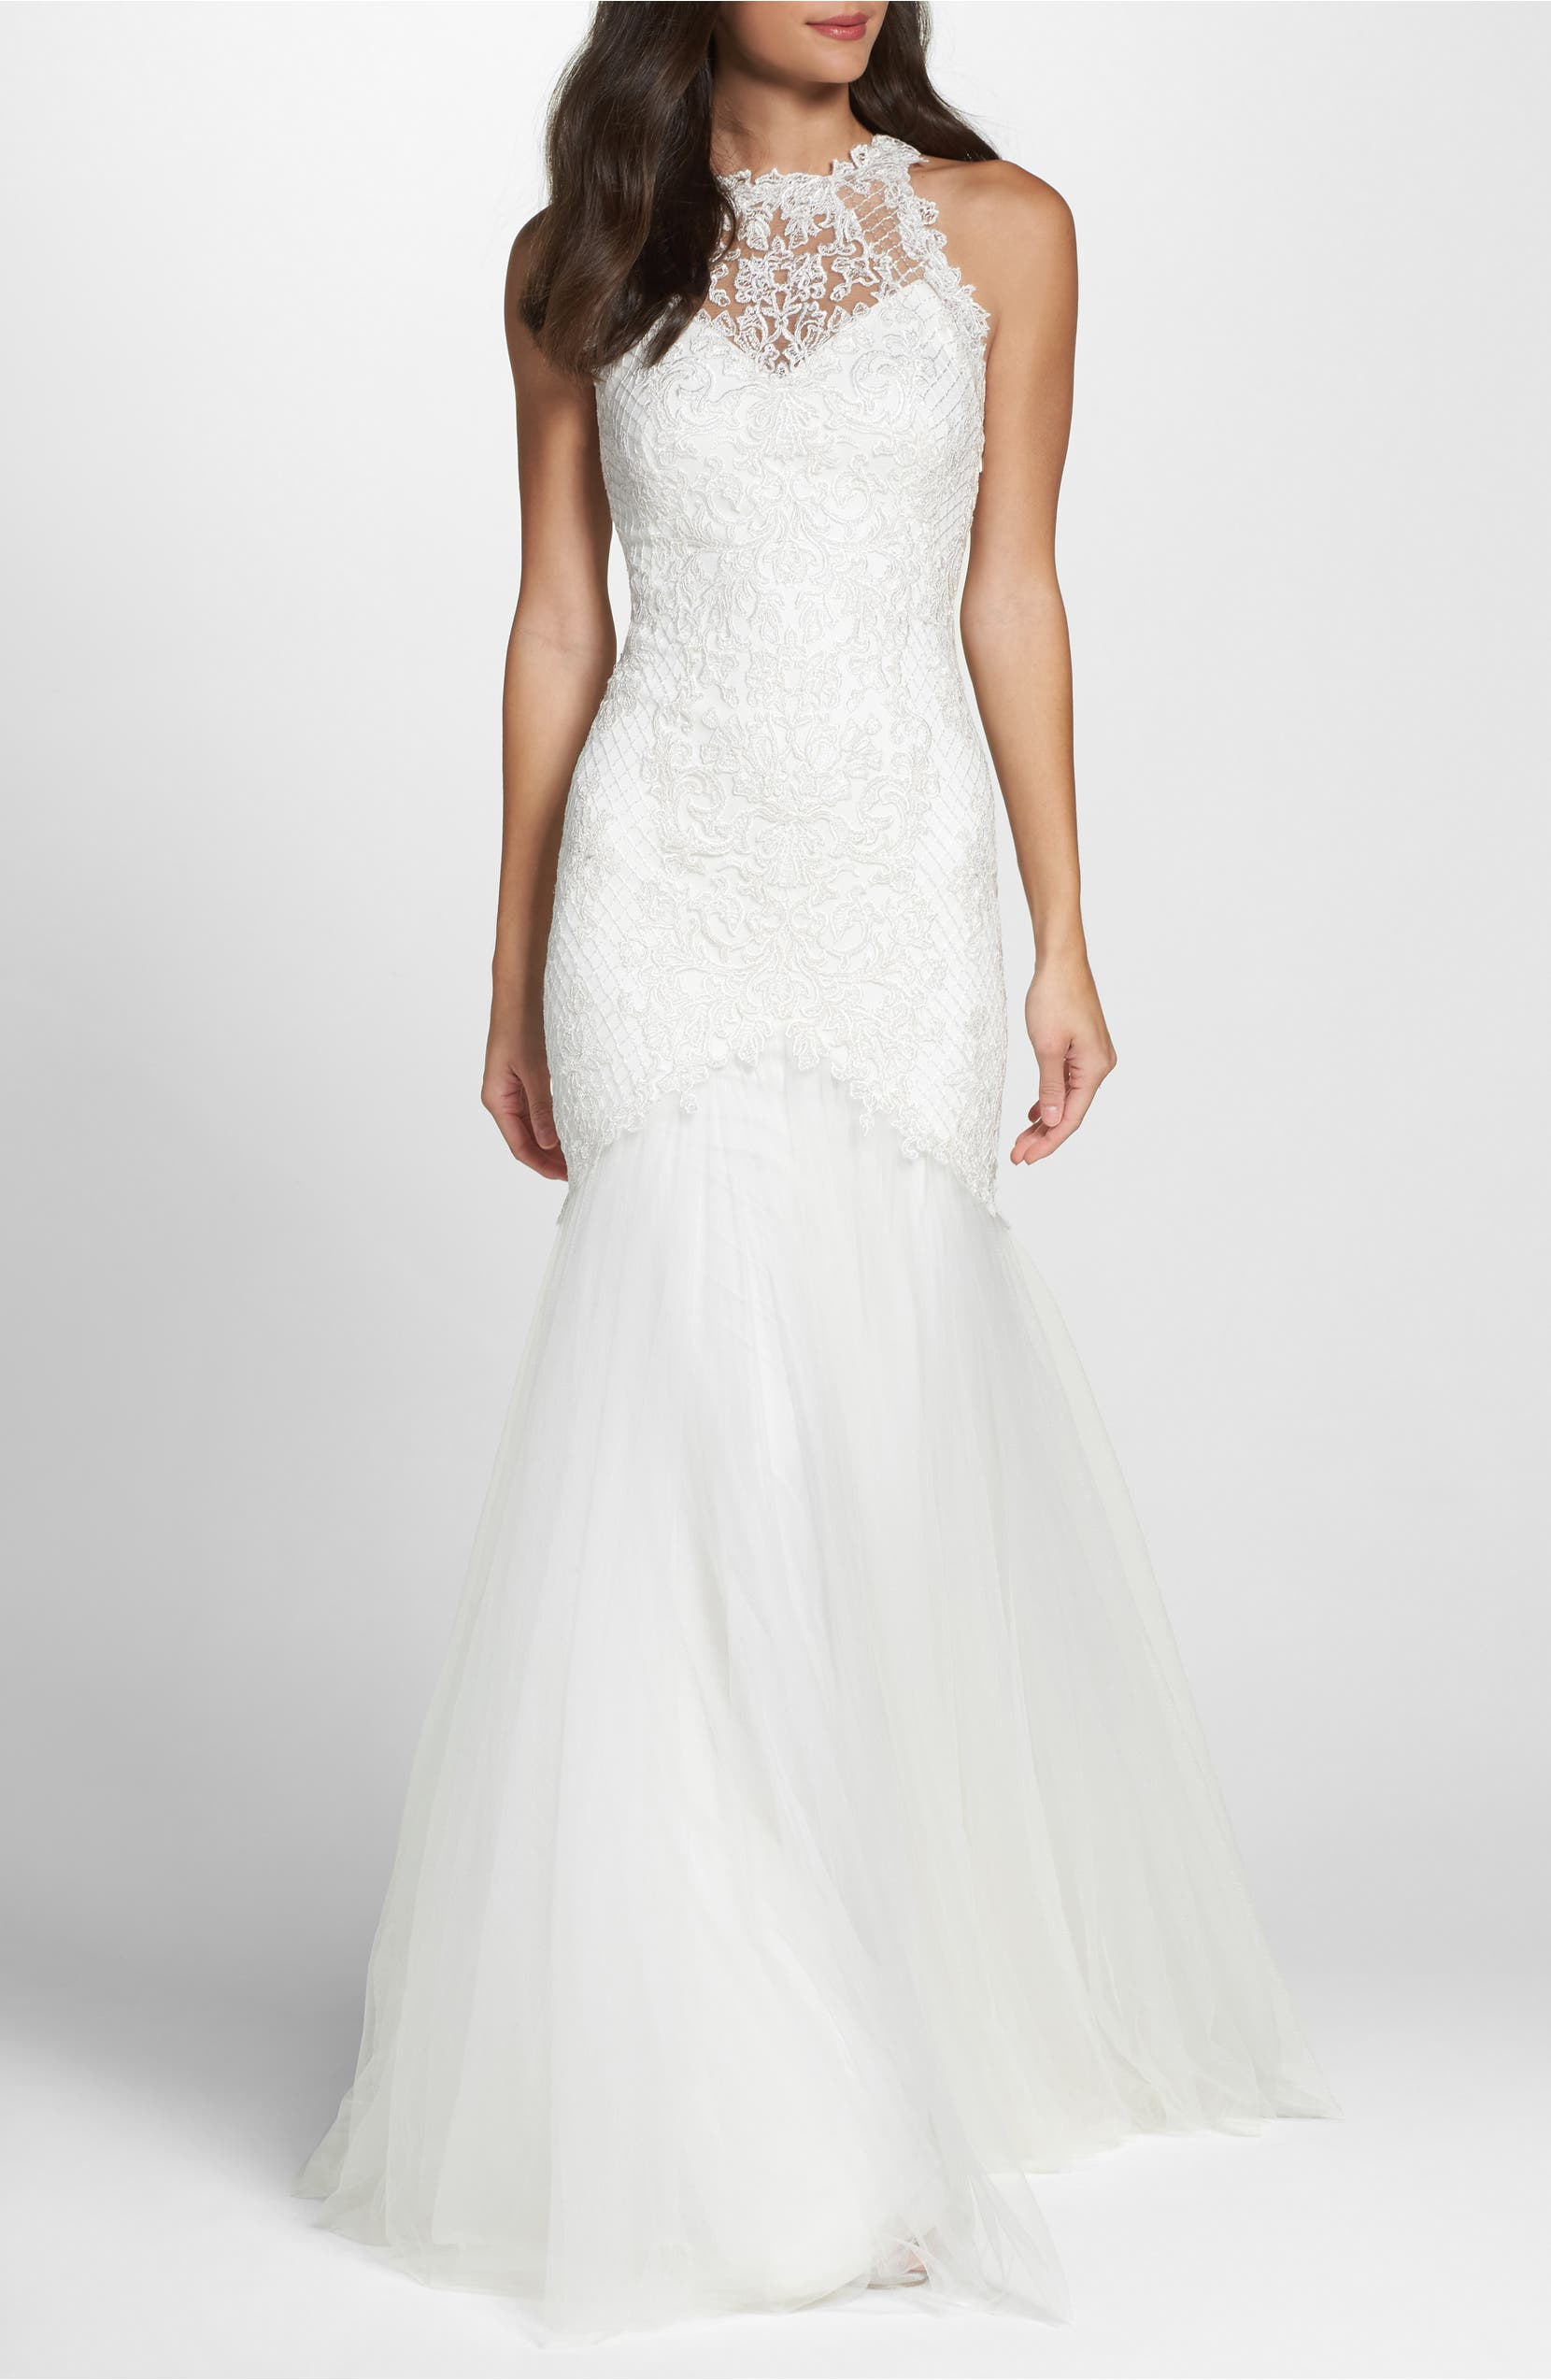 K'Mich Weddings - wedding planning - affordable wedding dresses - Tadashi shoji Lace Halter Mermaid Gown - Nordstrom